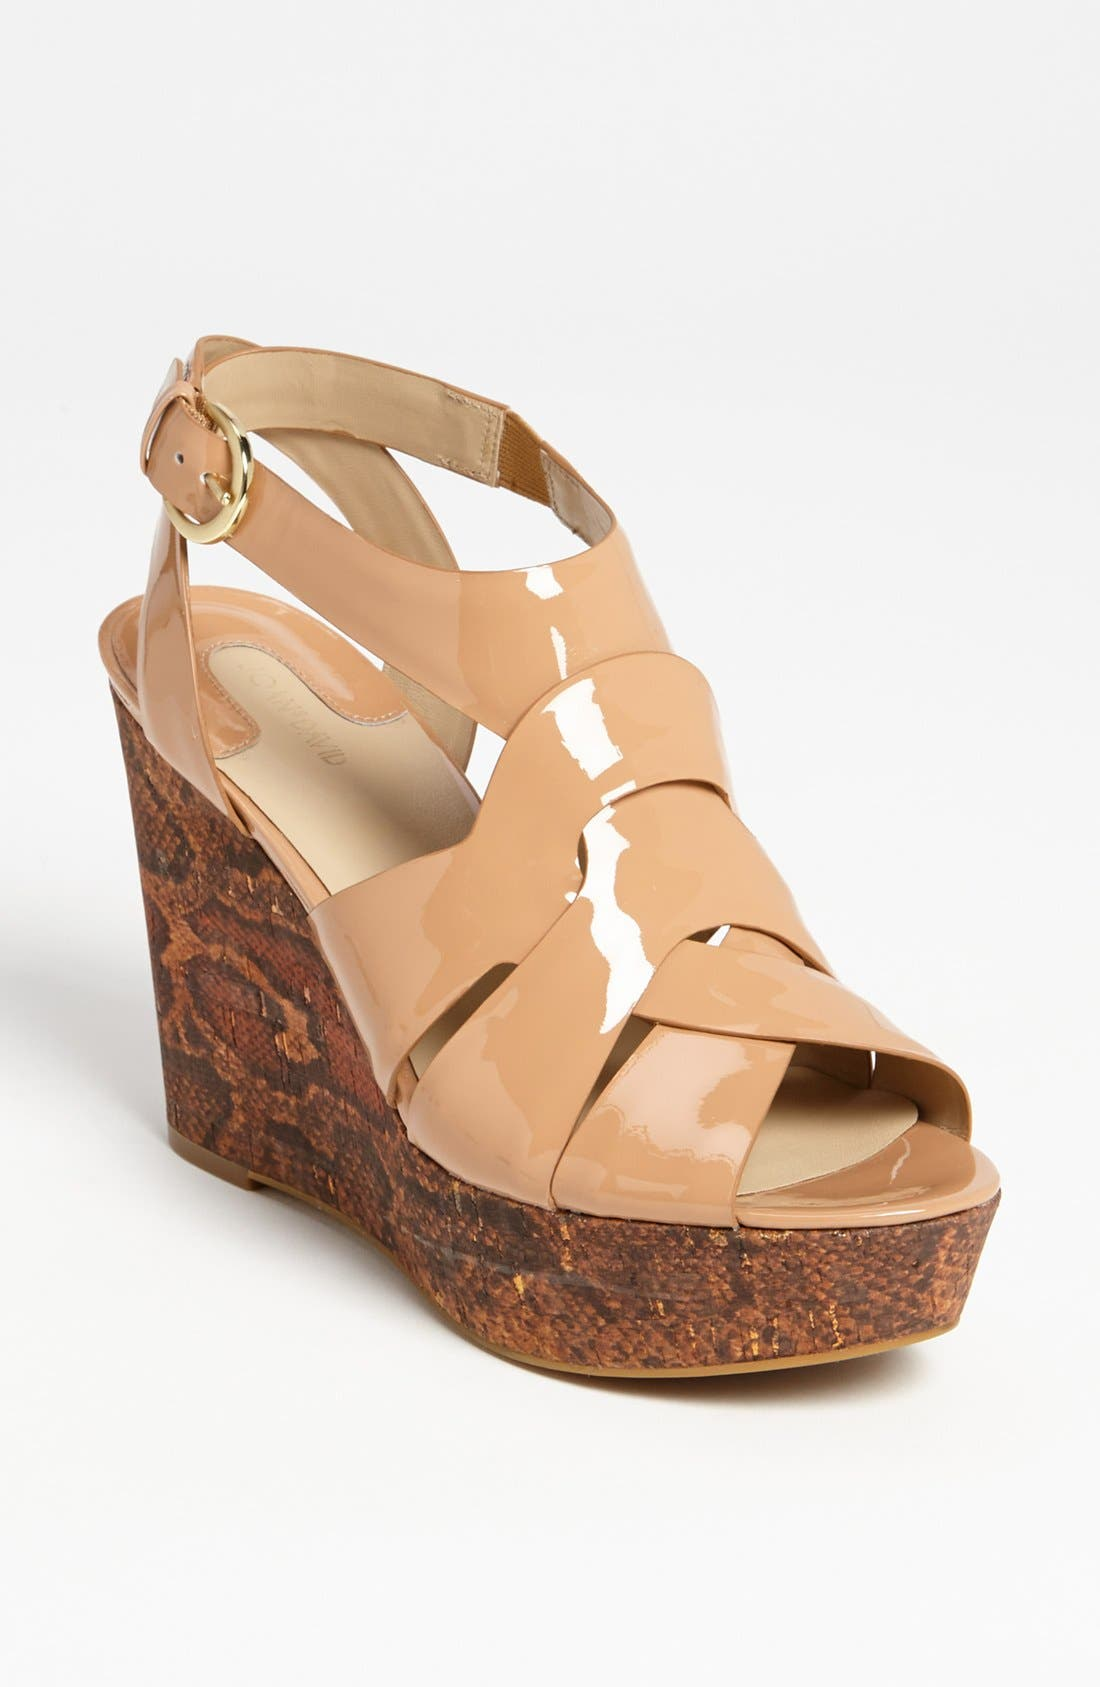 Main Image - Joan & David 'Isleen' Sandal (Special Purchase)